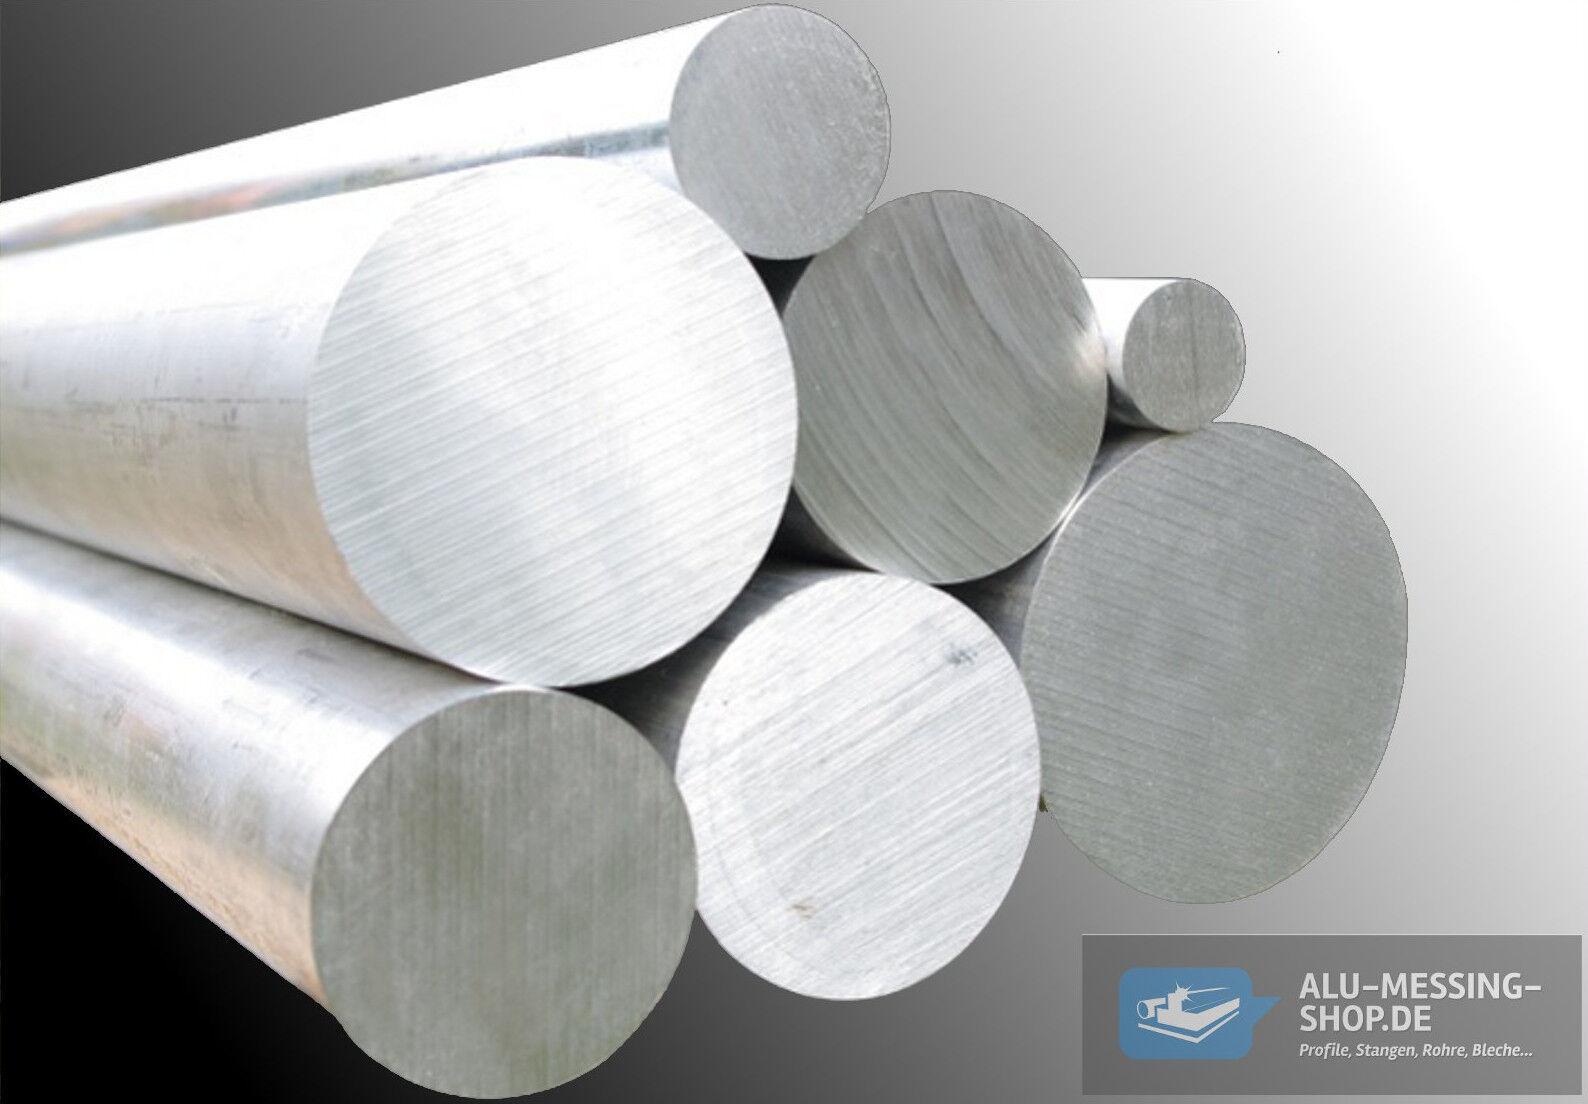 Aluminio redondo Ø 105mm longitud aproximadamente elegibles barra Alu alcumgpb alrededor de varilla de material